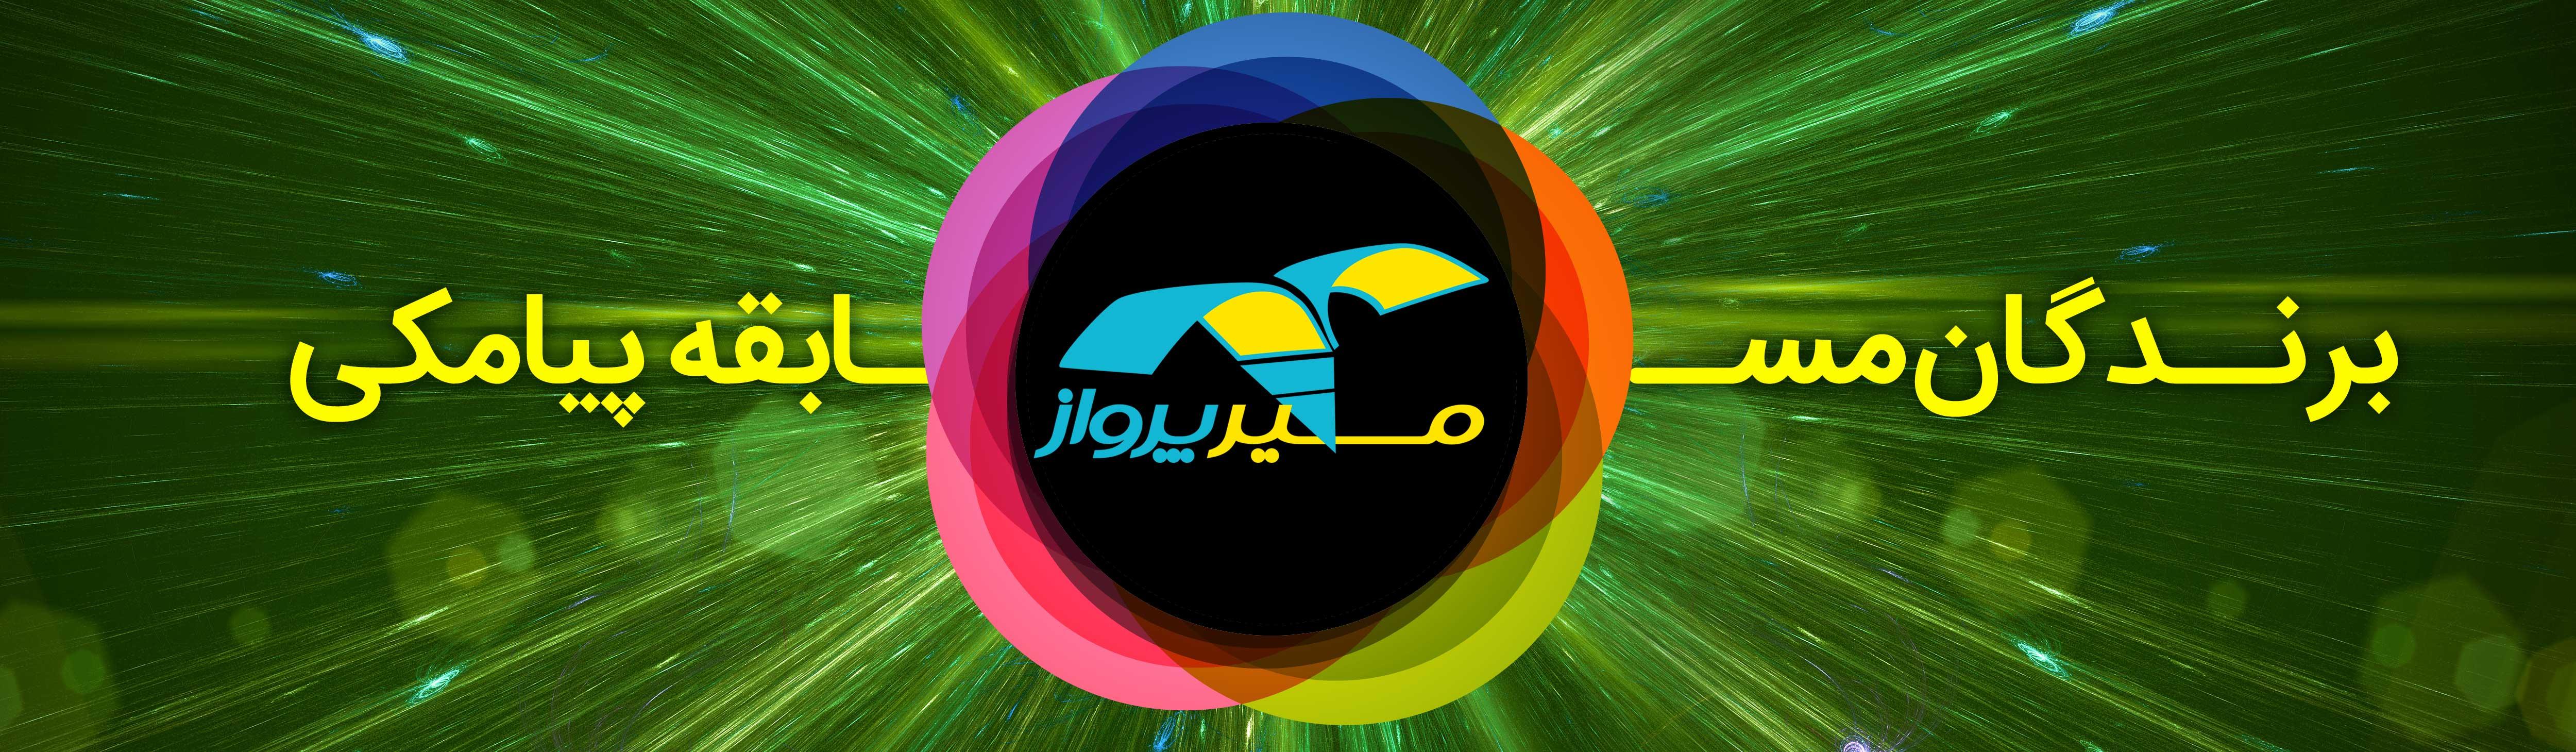 پخش مسابقه تلویزیونی مسیر پرواز